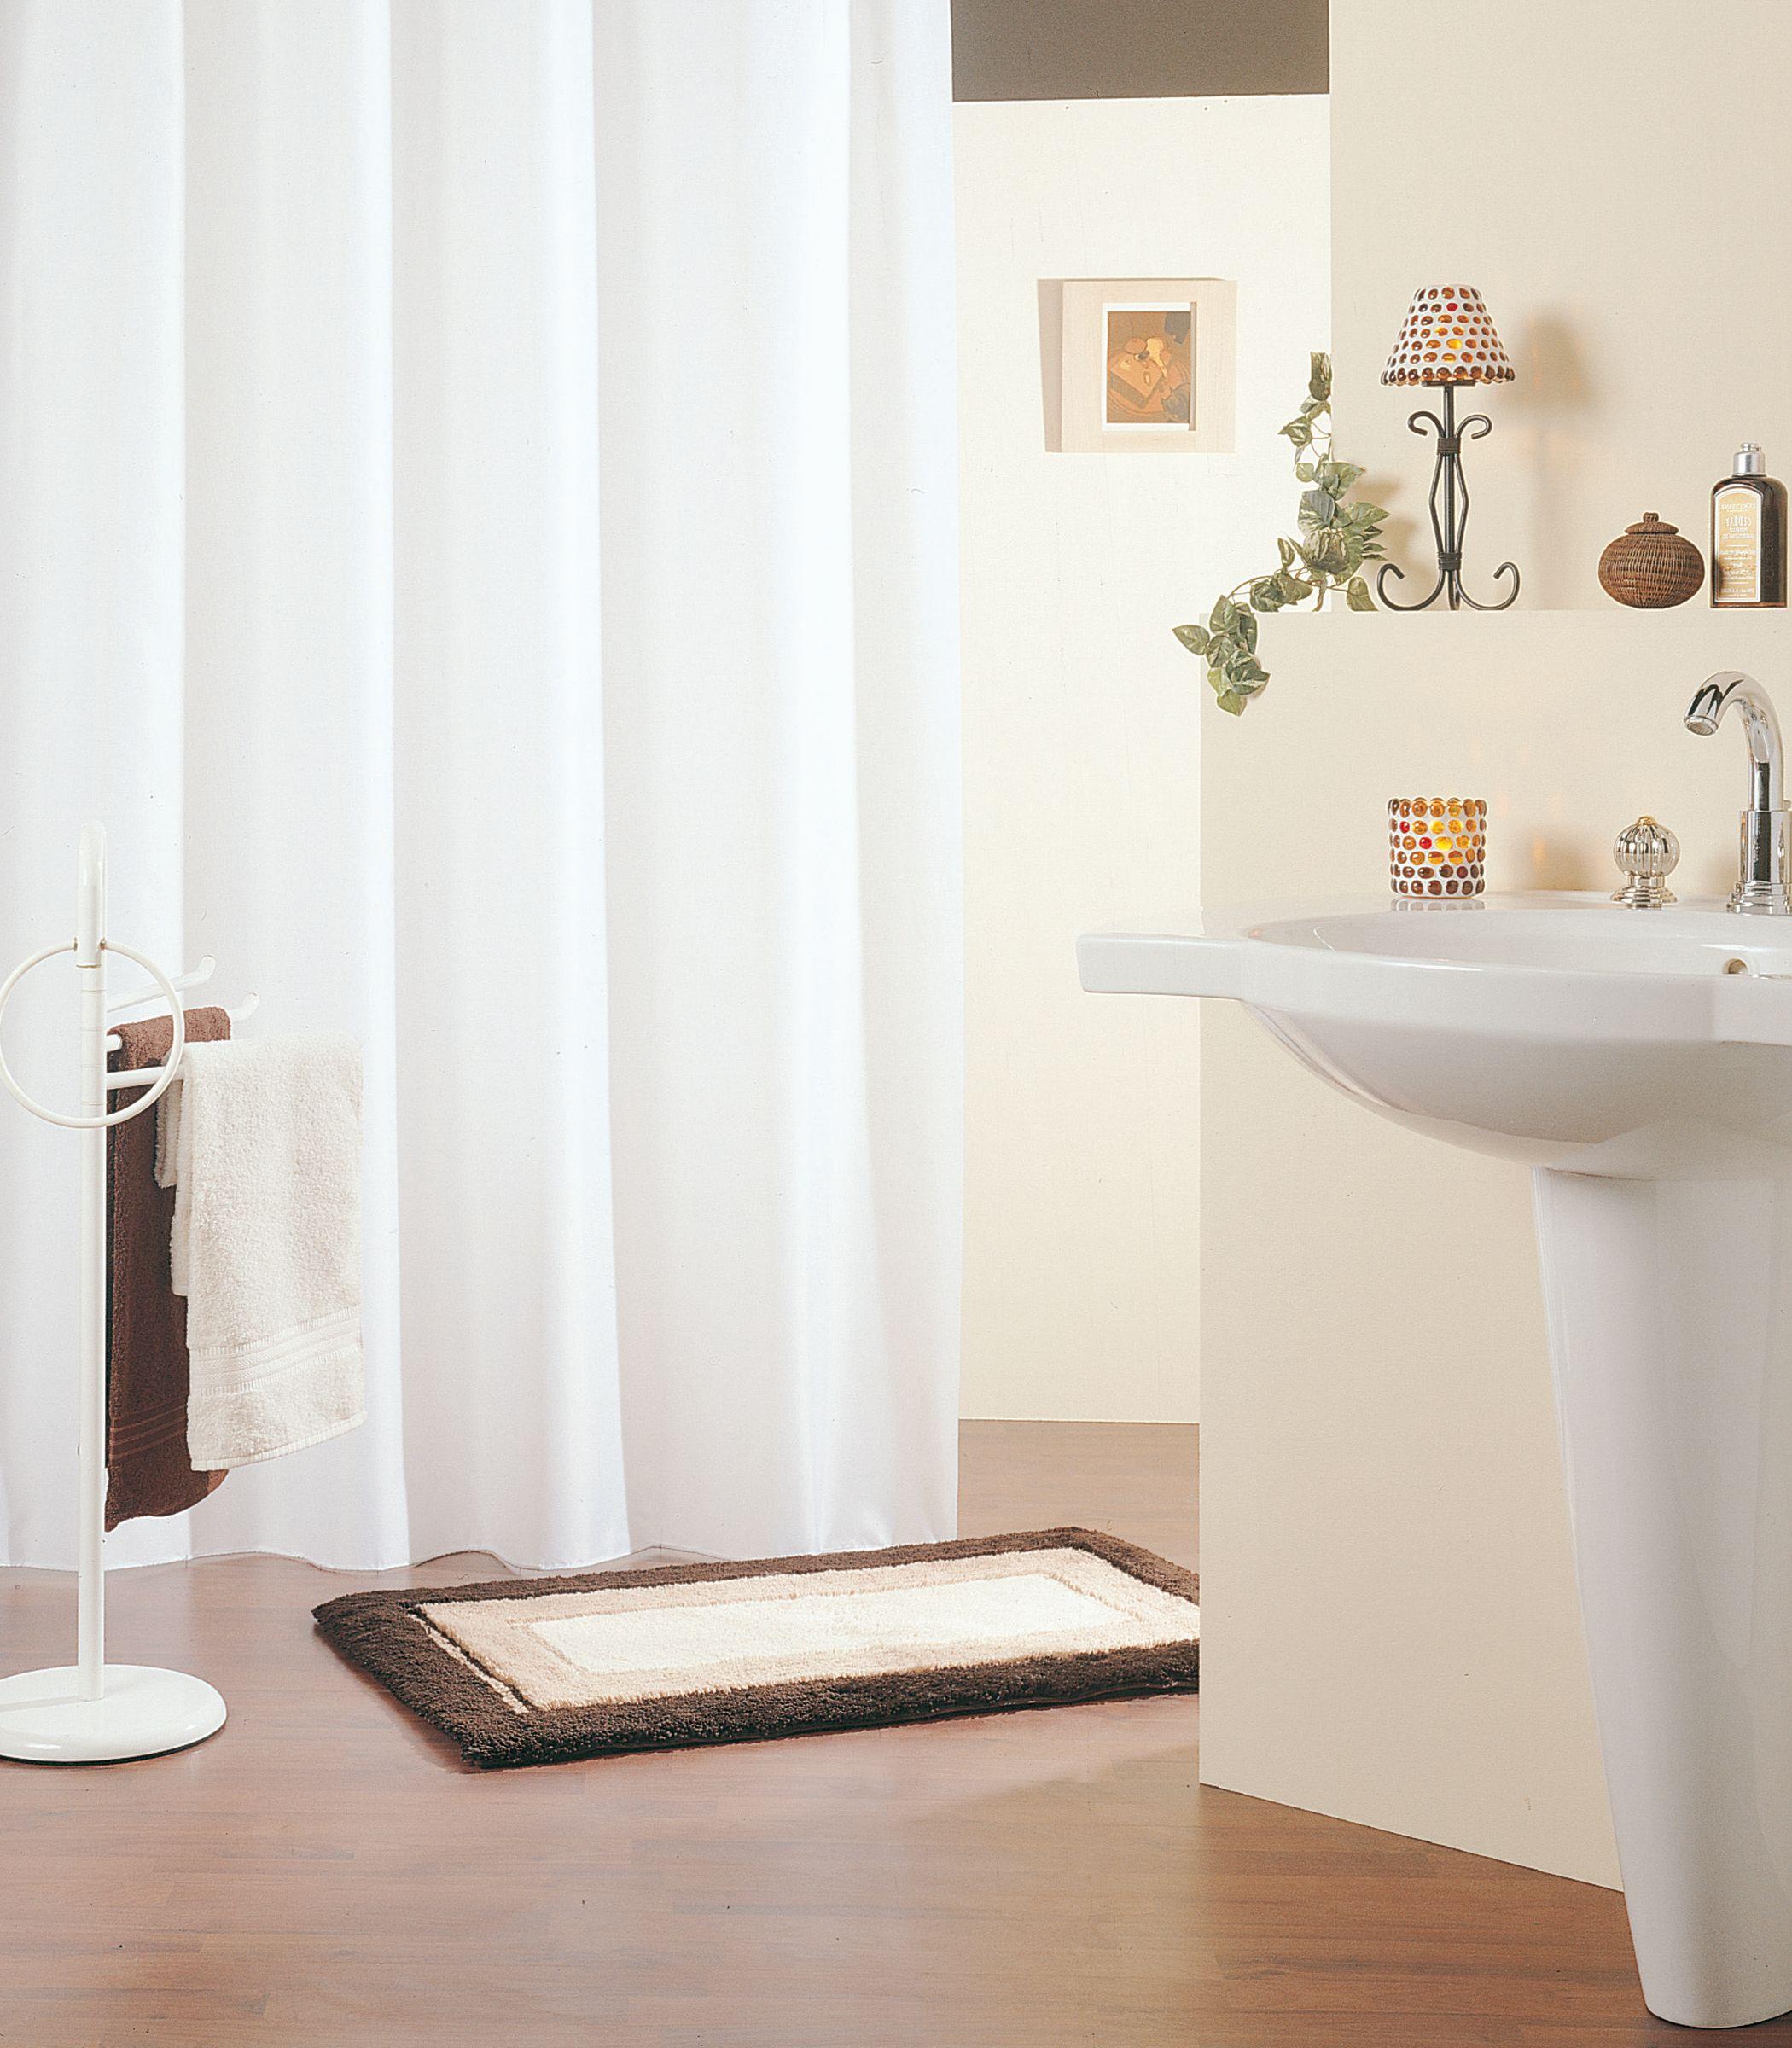 rideau baignoire rigide great wonderful pare baignoire. Black Bedroom Furniture Sets. Home Design Ideas